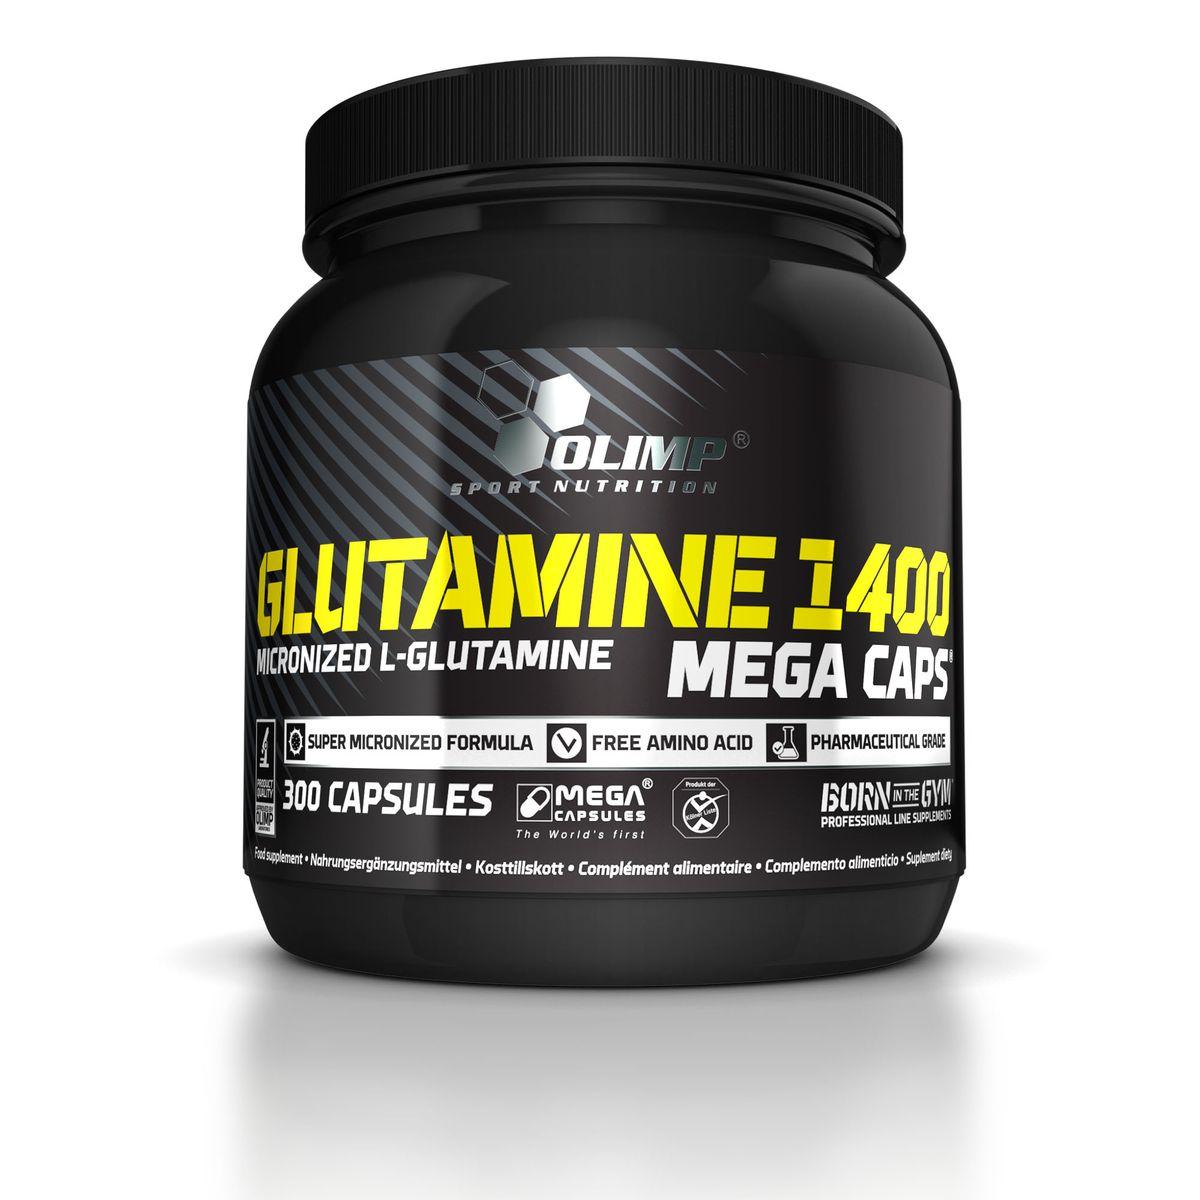 OLIMP Глютамин 1400 Мега Капс, 300 капс